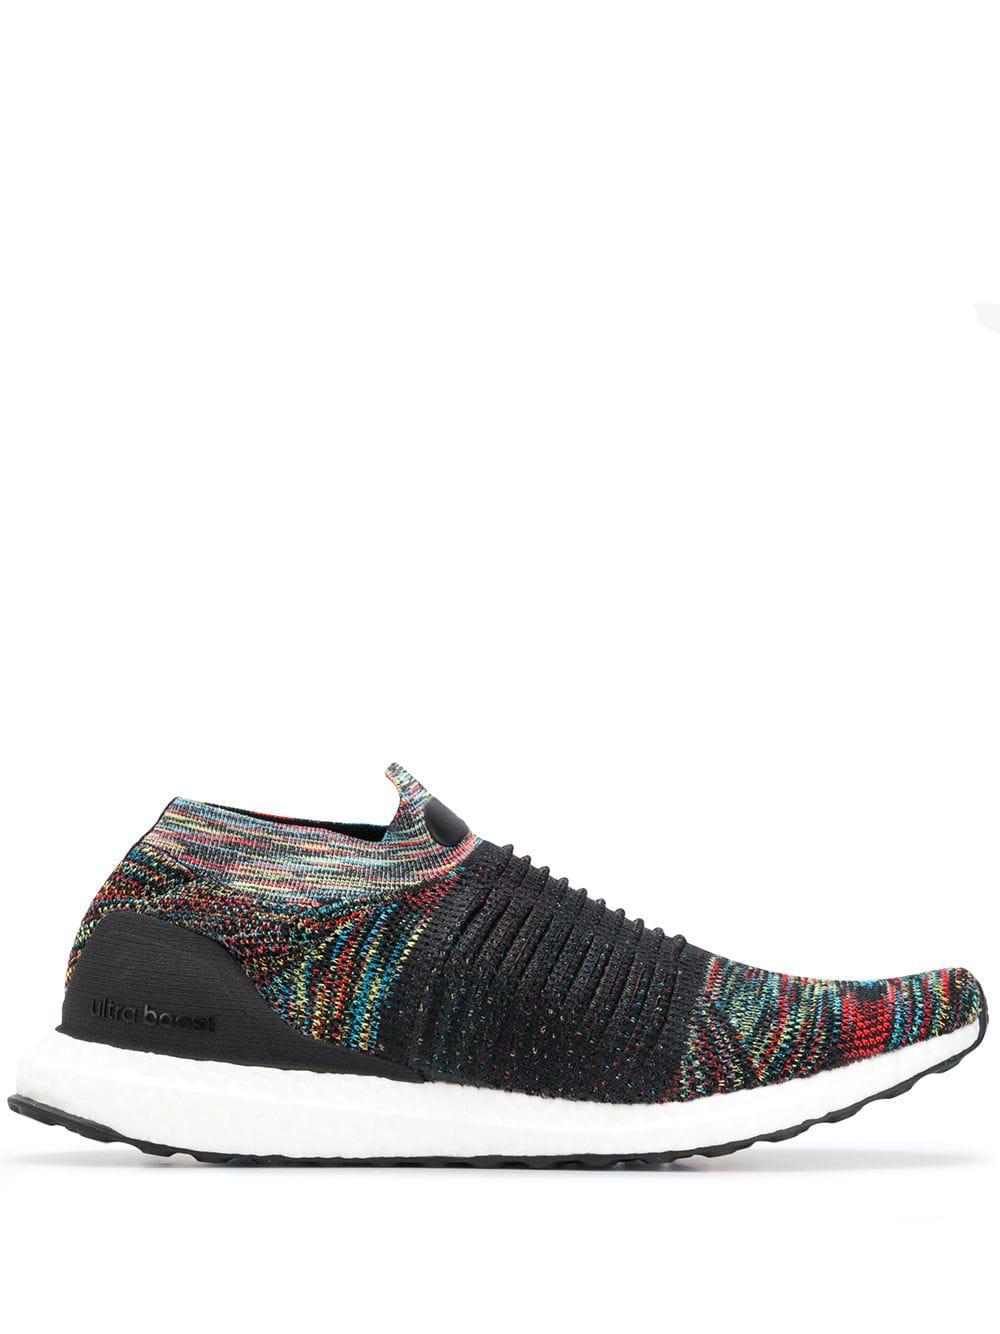 345590f3b7e Adidas Originals Adidas Ultraboost Laceless Sneakers - Black